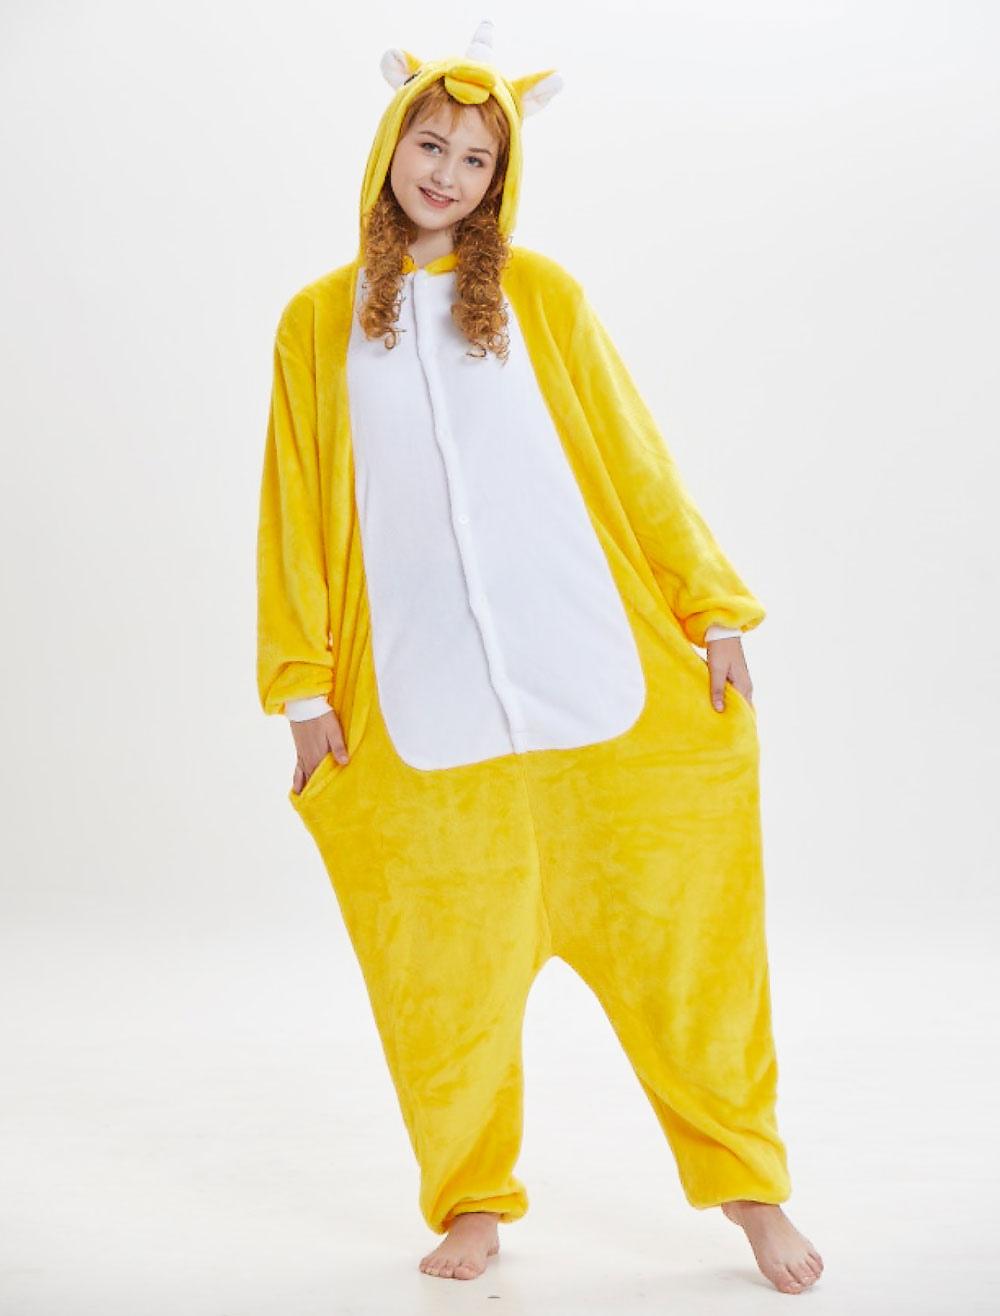 ... Unicorn Kigurumi Onesie Pajamas Pegasus Yellow Flannel Unisex Adults  Jumpsuits-No.6. 12. 40%OFF. Color Yellow b0c889e19